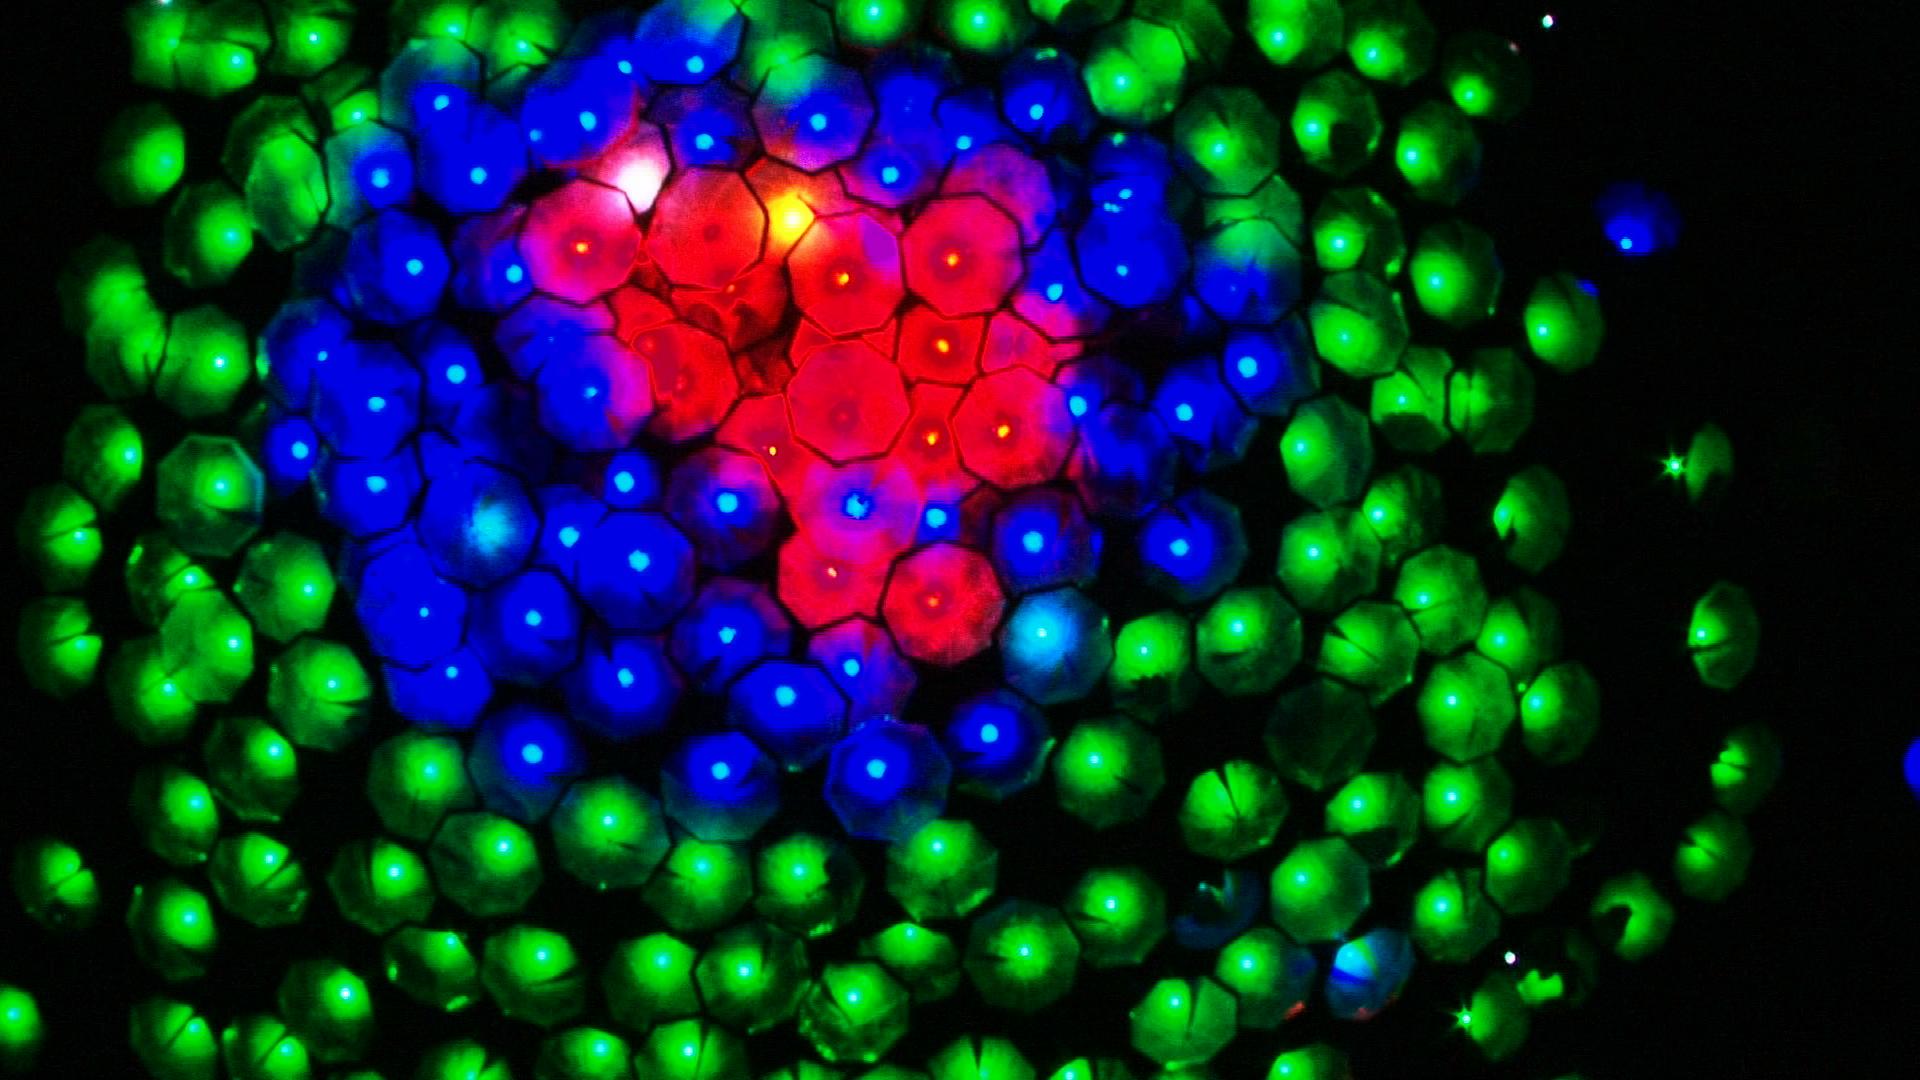 Desktop Wallpaper Colorful wallpaper HD Desktop Wallpaper Colorful 1920x1080